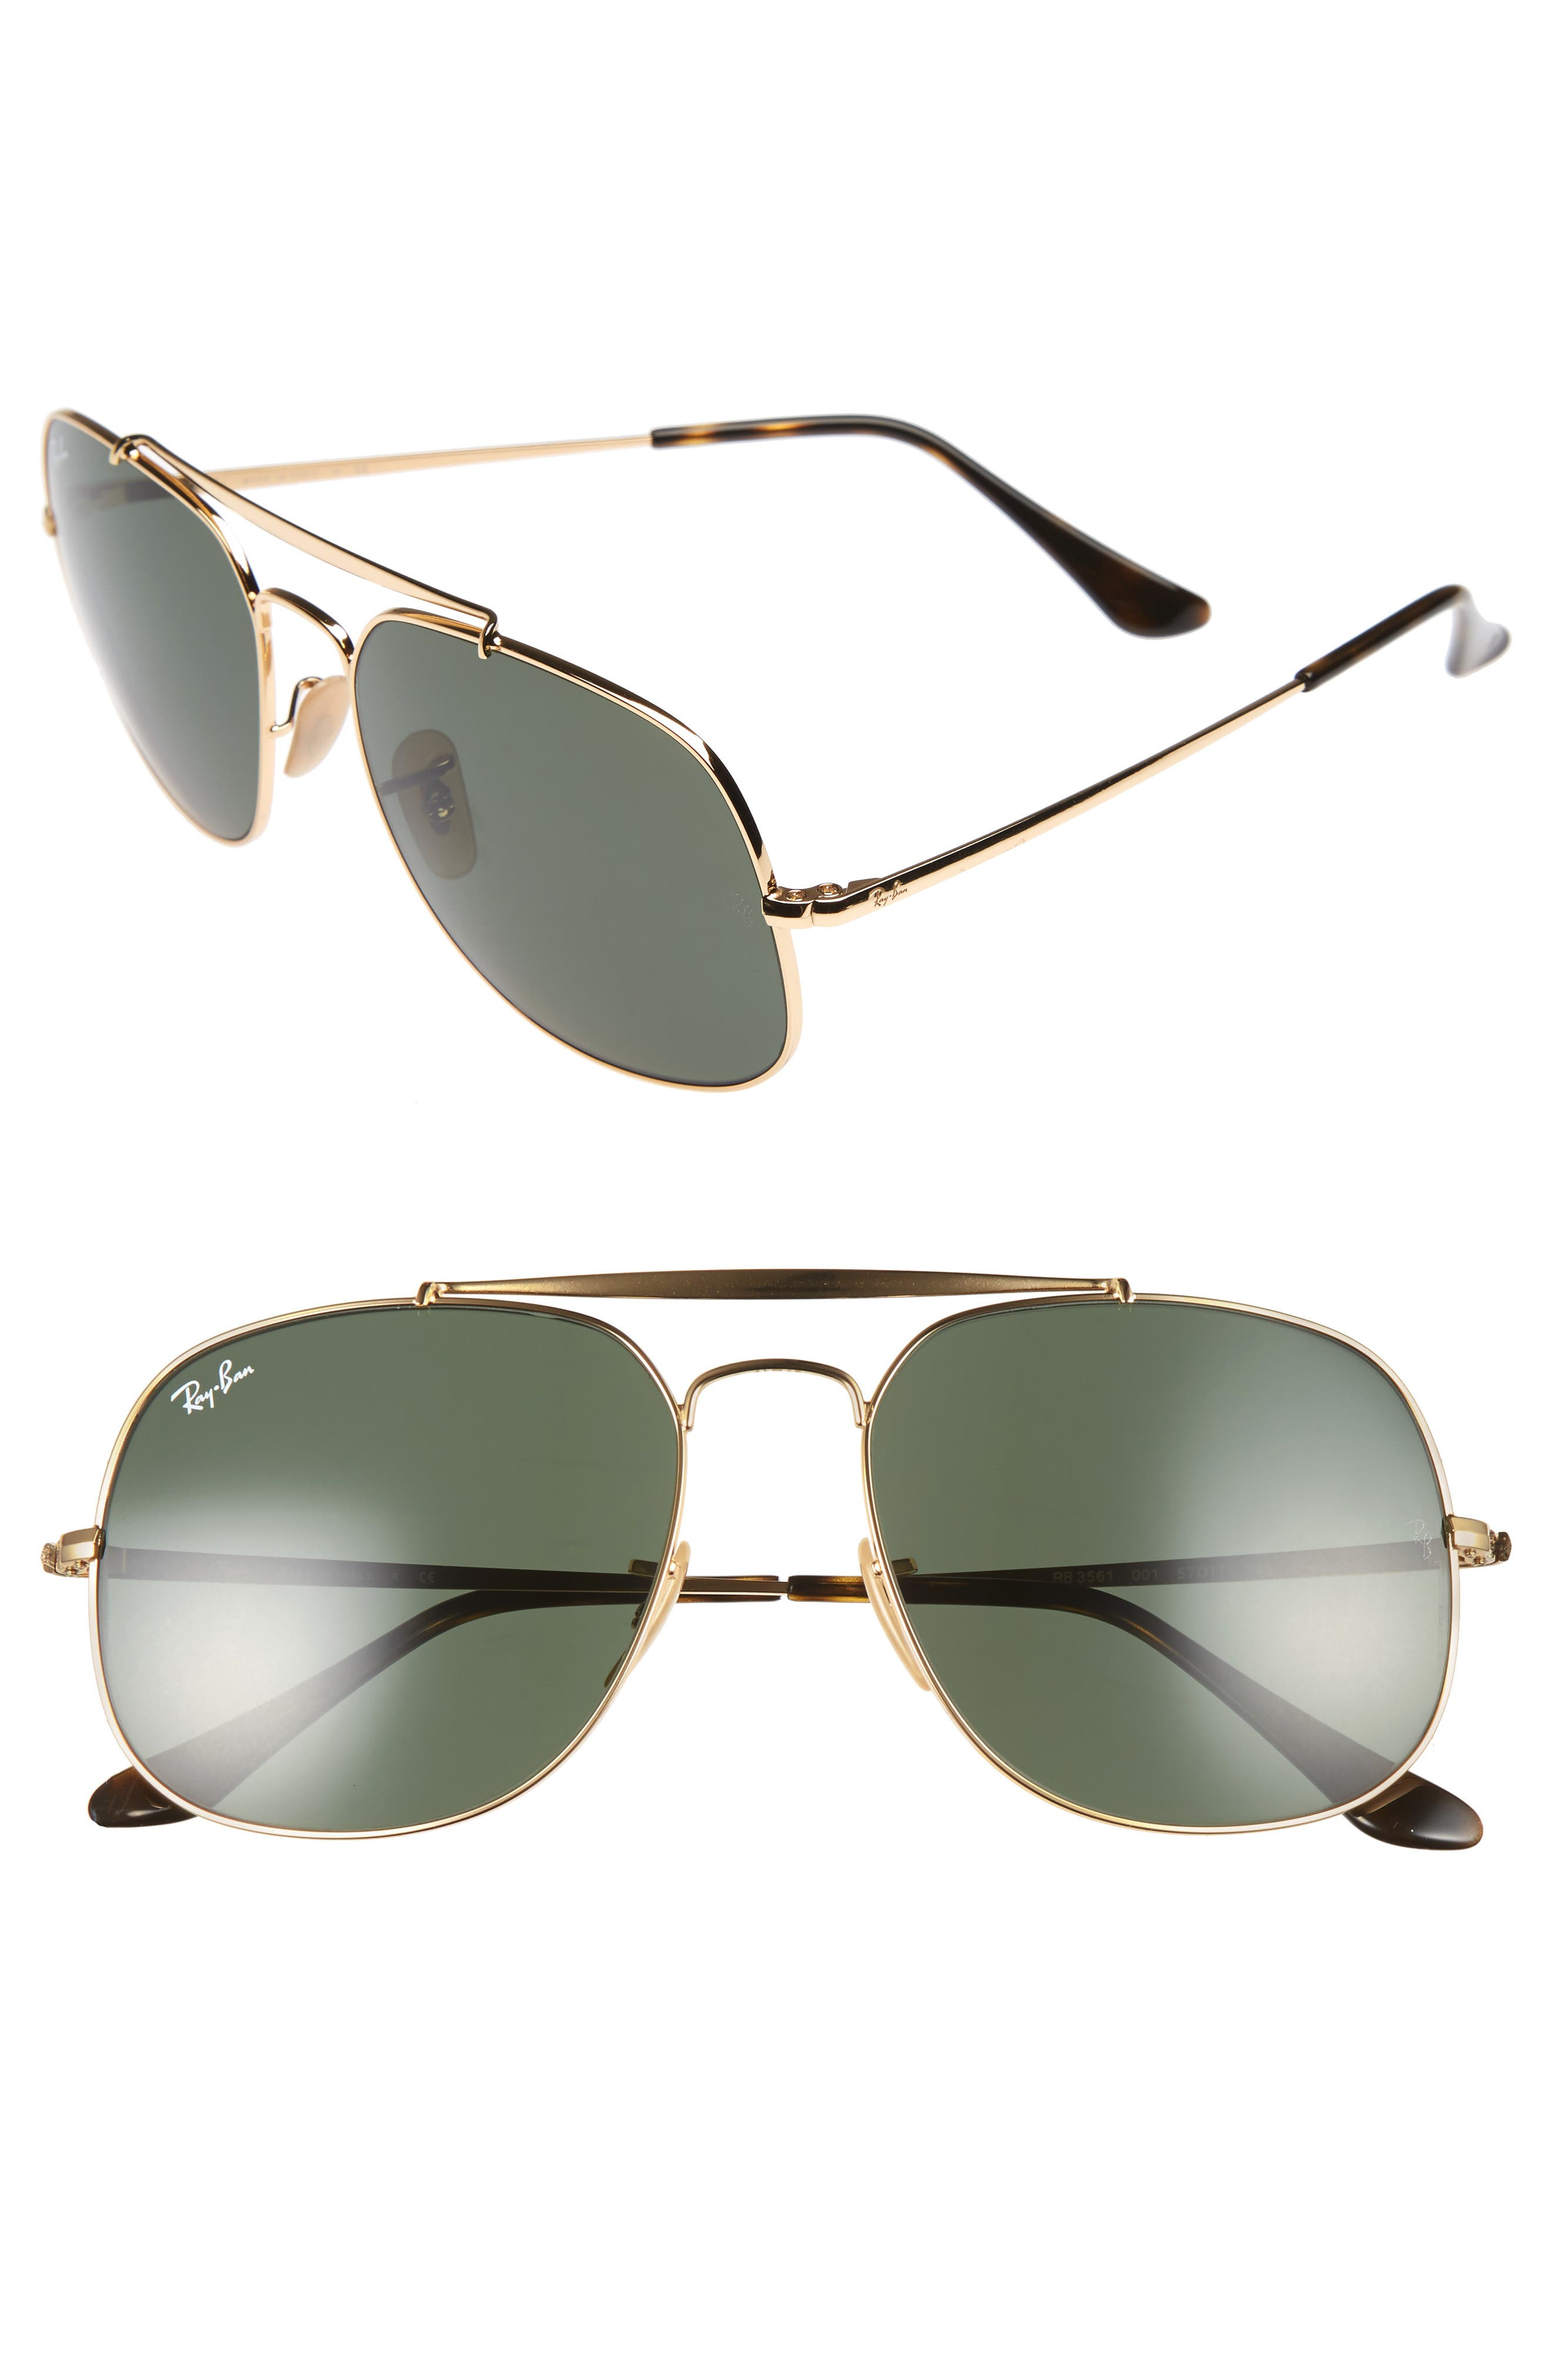 Main Image - Ray-Ban 57mm Aviator Sunglasses